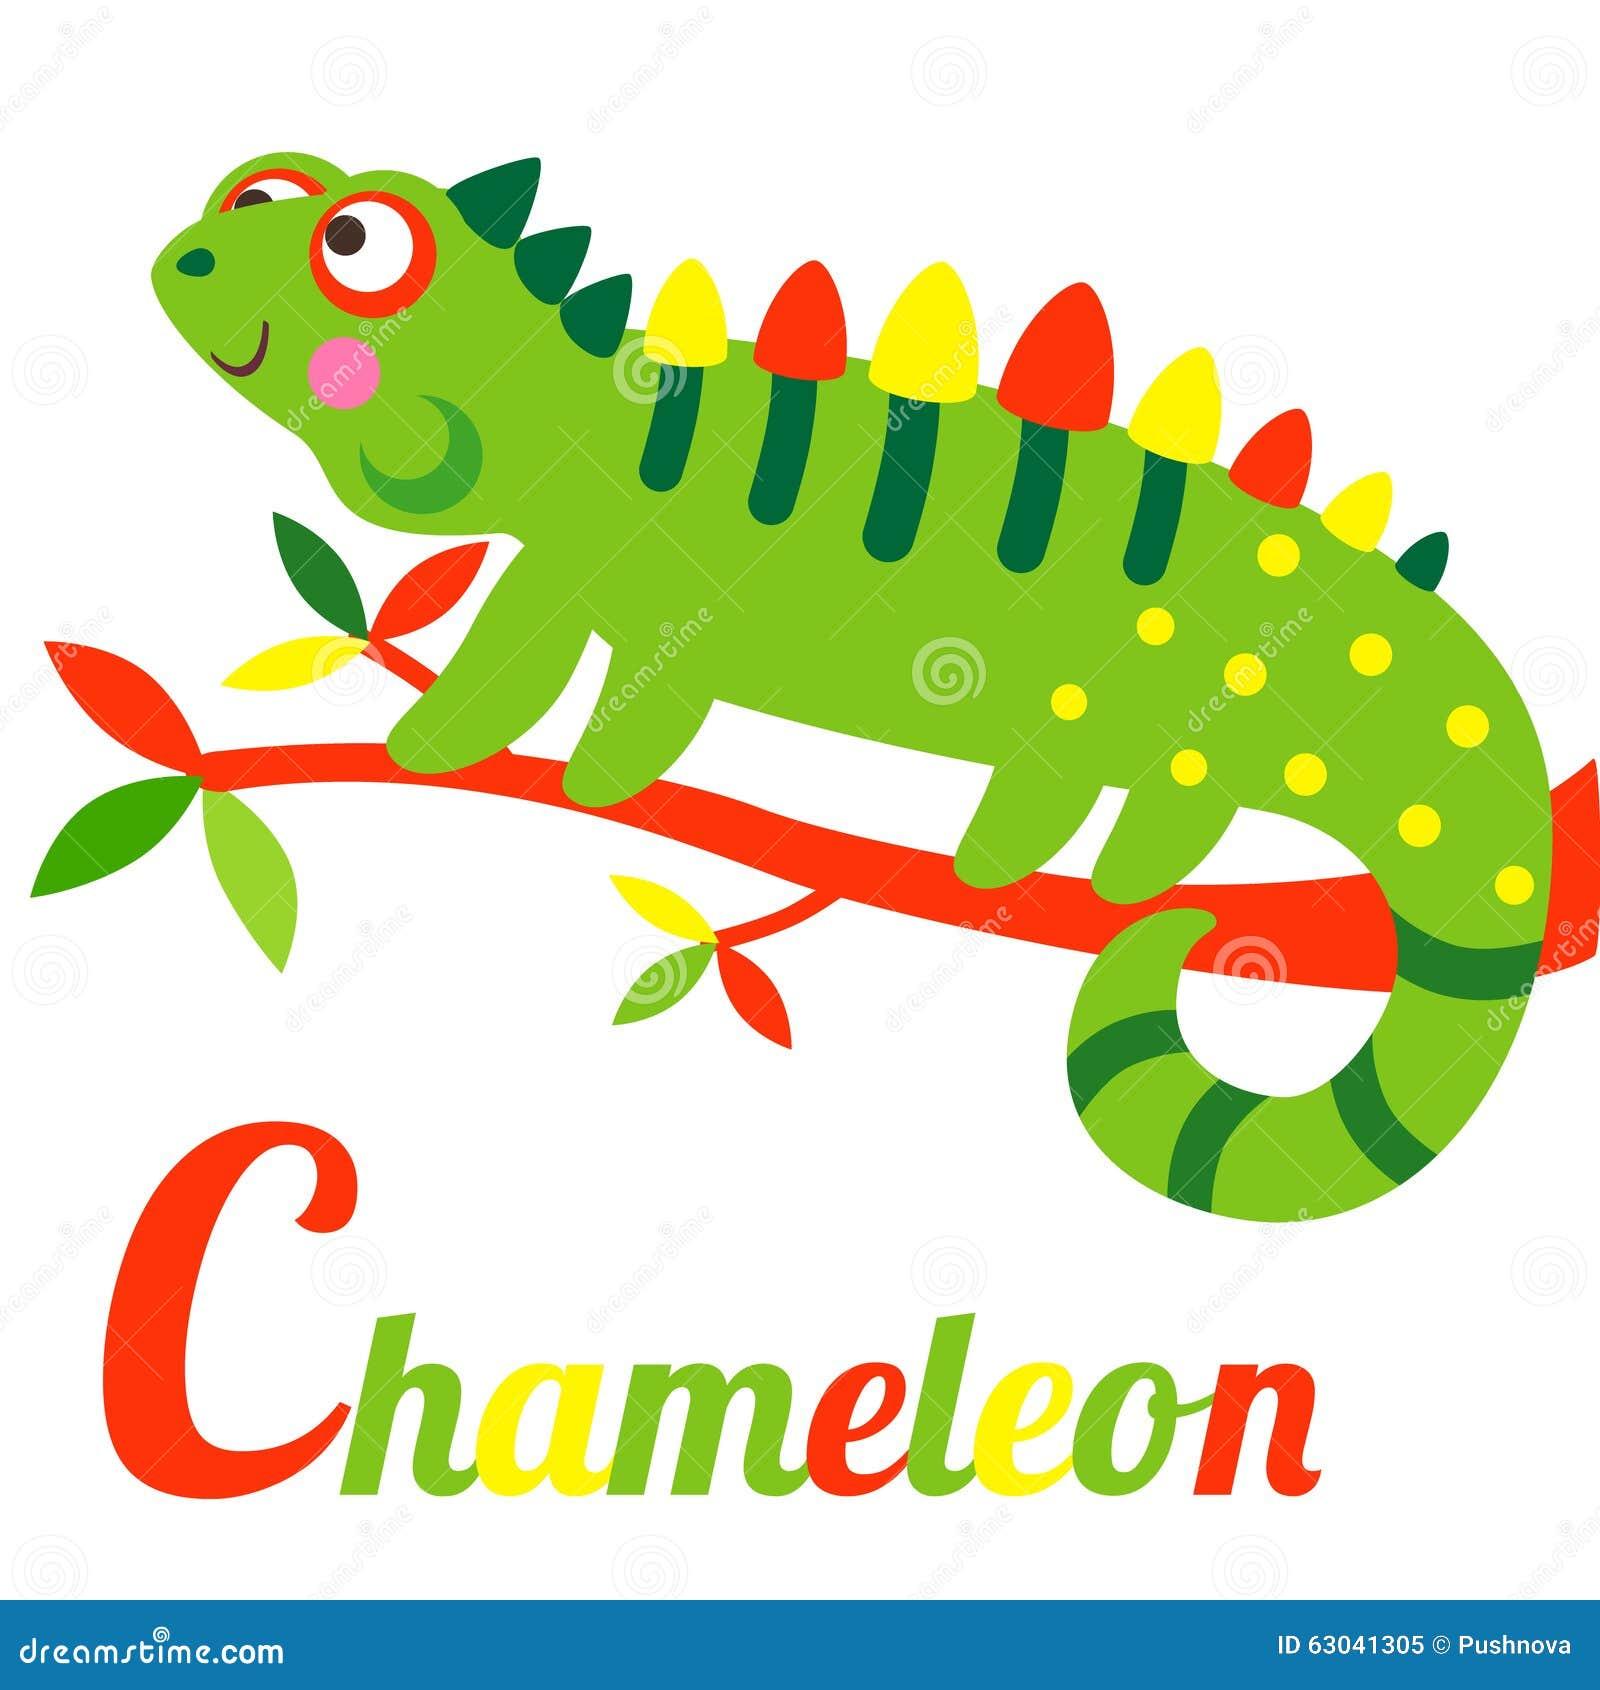 Stock Illustration Chameleon Cute Animal Alphabet C Letter Cute Cartoon Alphabet Design Colorful Style Image63041305 on Preschool Chameleon Art